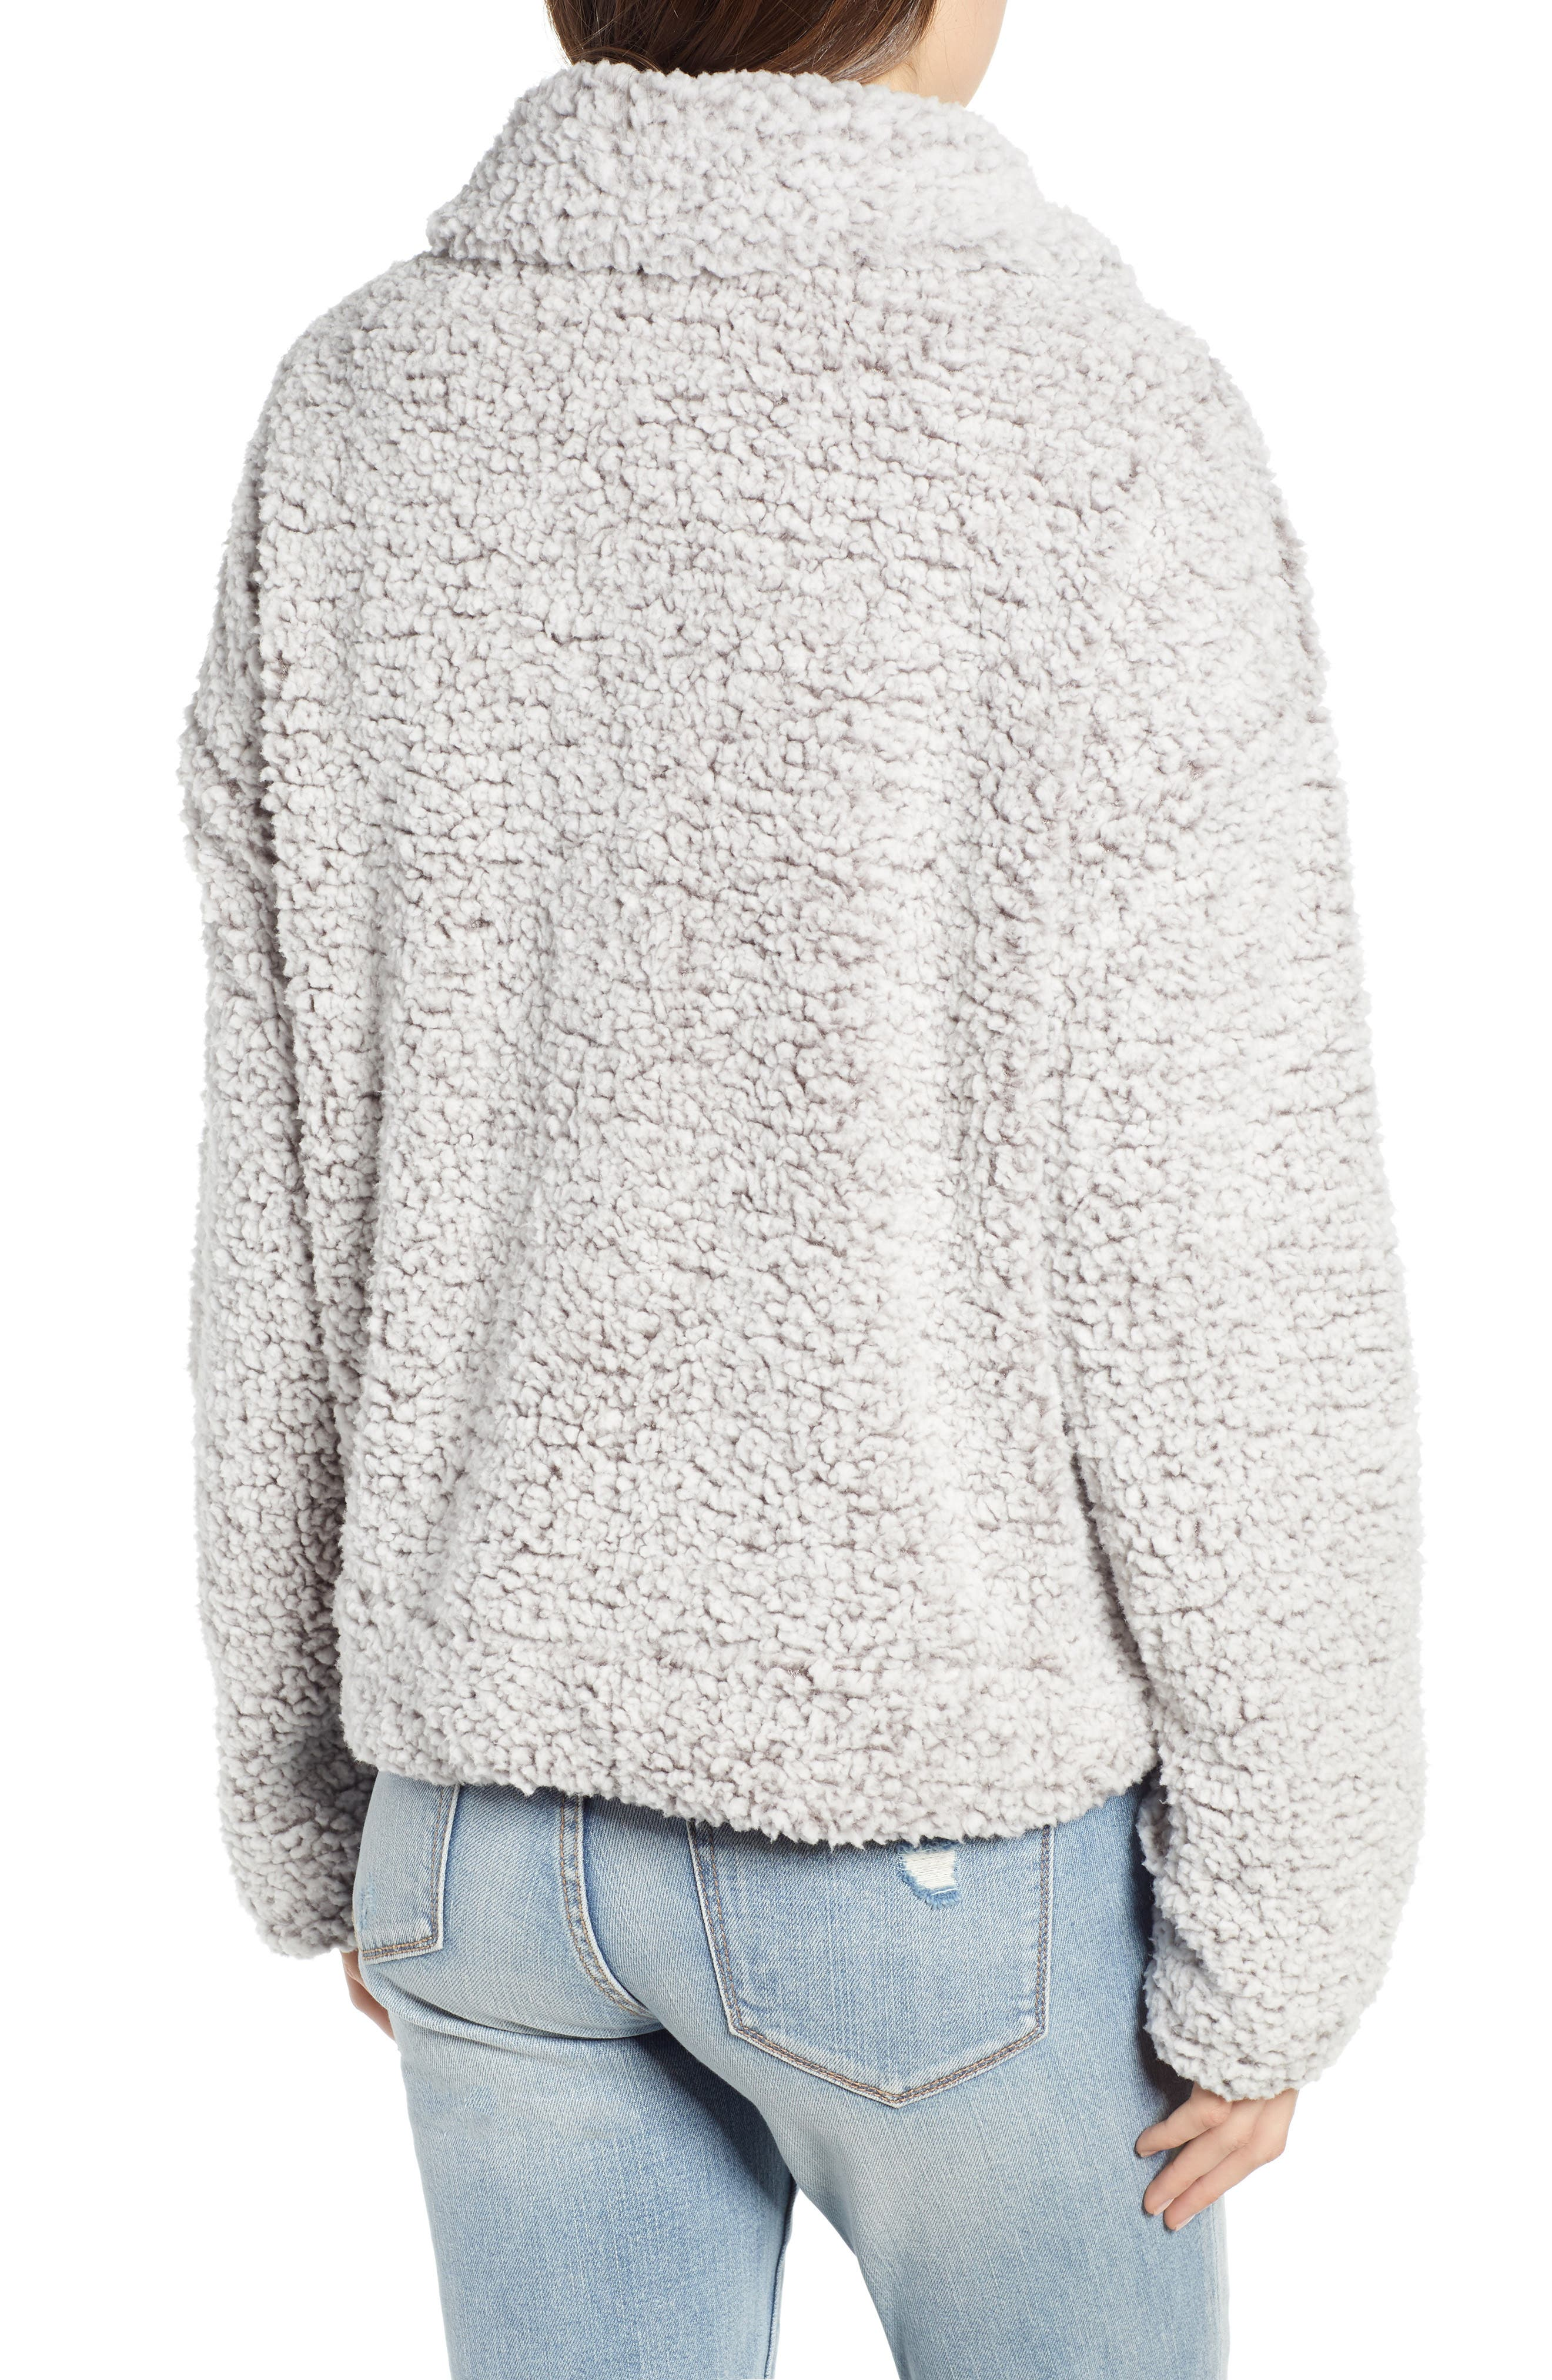 THREAD & SUPPLY, Quarter Zip Fleece Pullover, Alternate thumbnail 2, color, SILVER